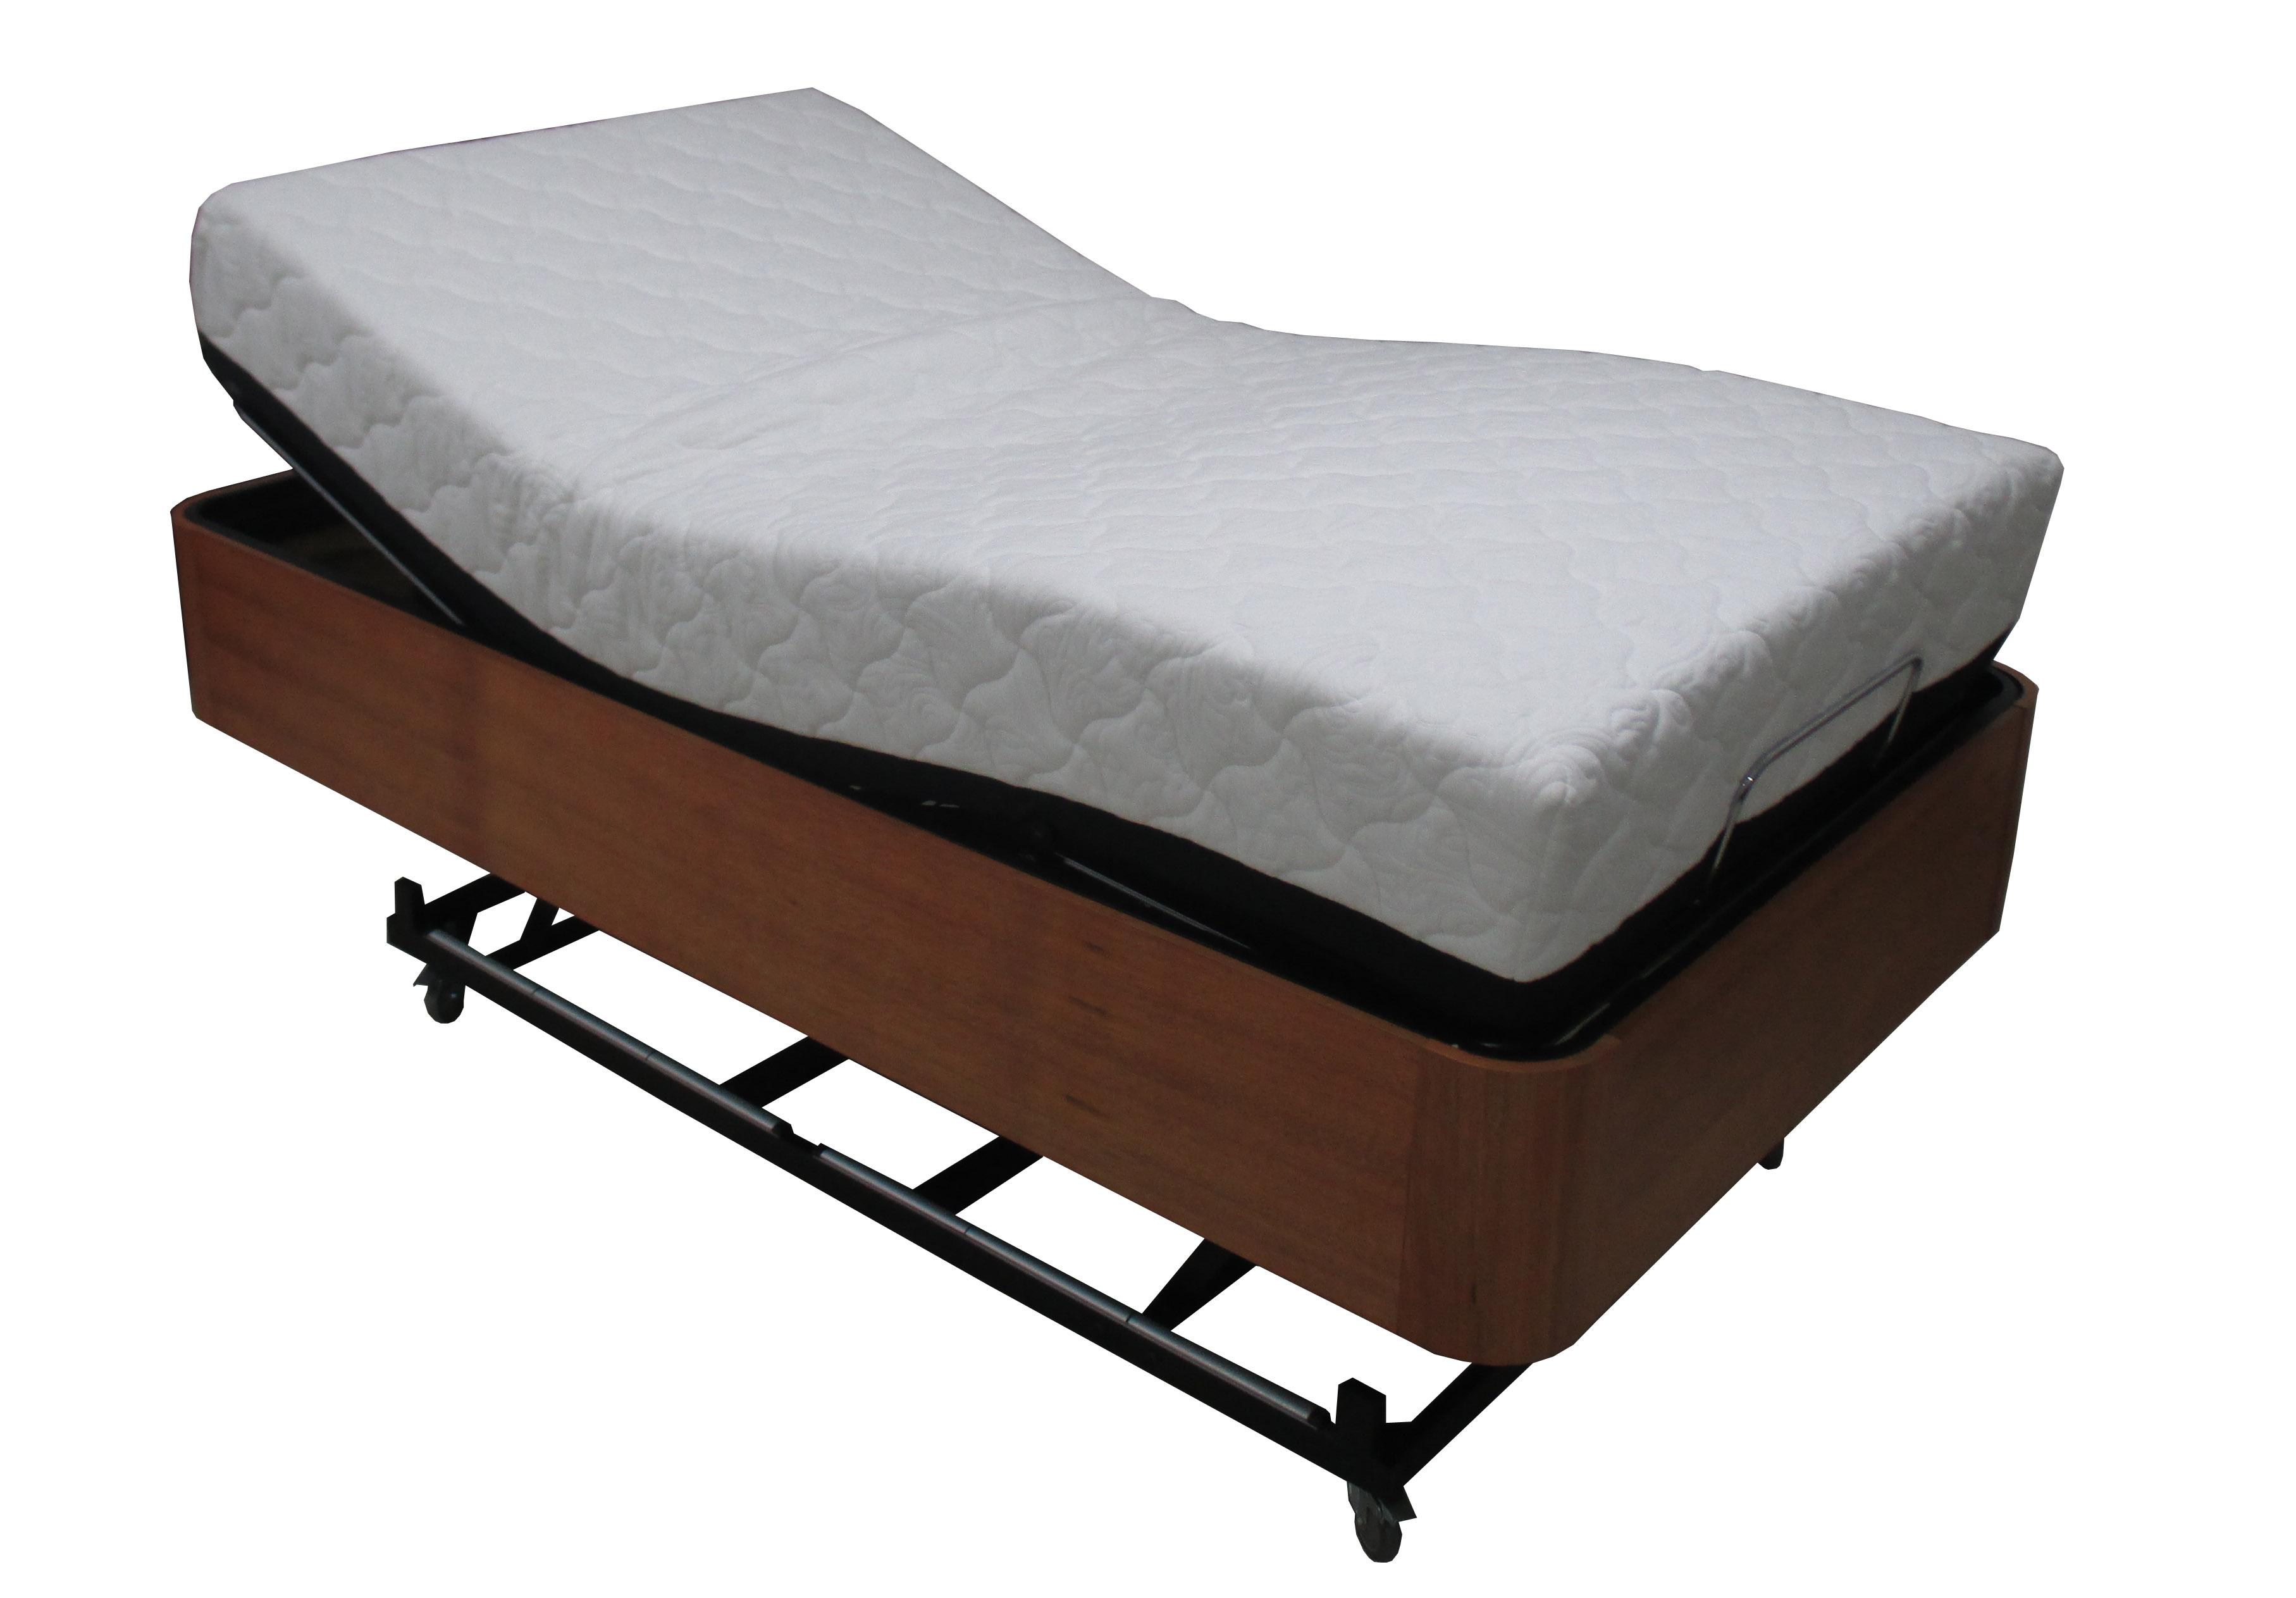 Adjustable beds zero gravity wallhugger wireless for Adjustable beds